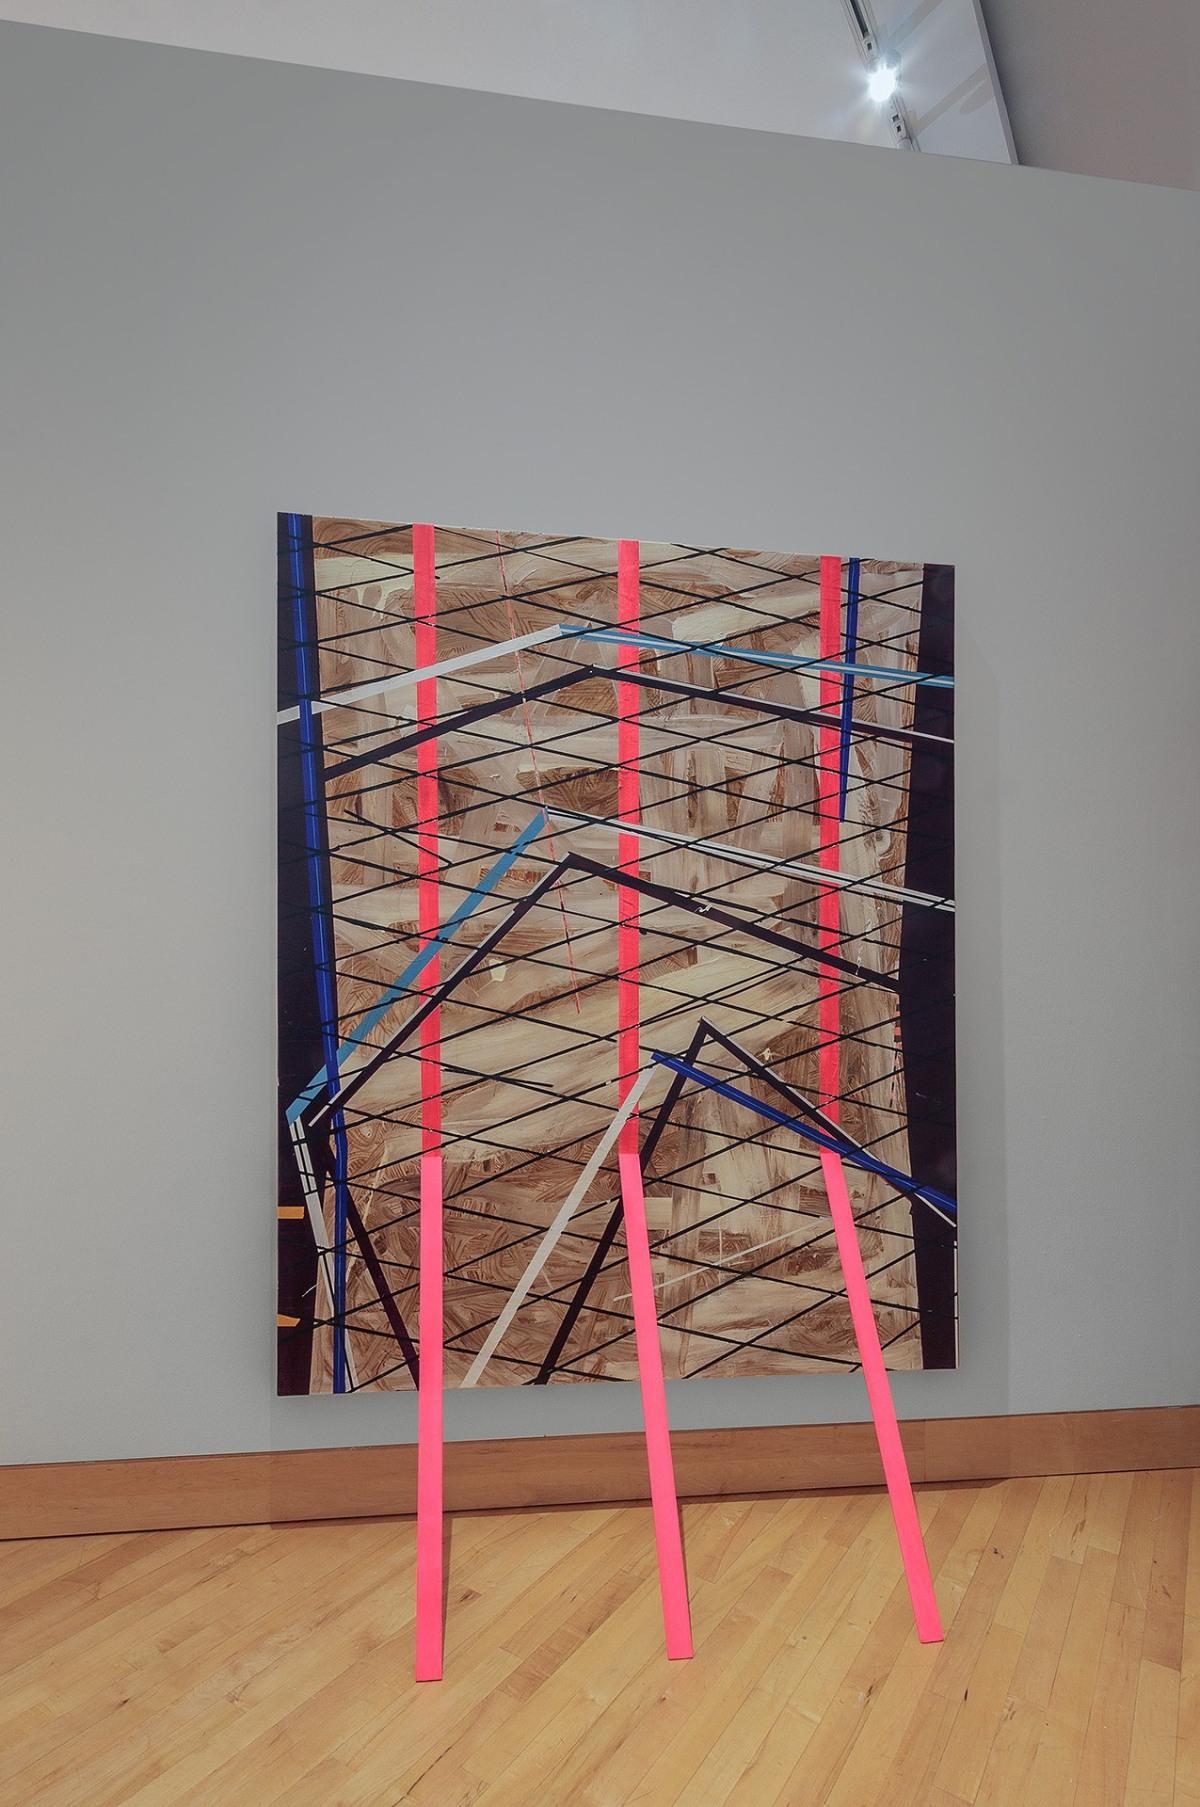 Installation view, Kelley Johnson, Greenlease Gallery, Rockhurst University Kans